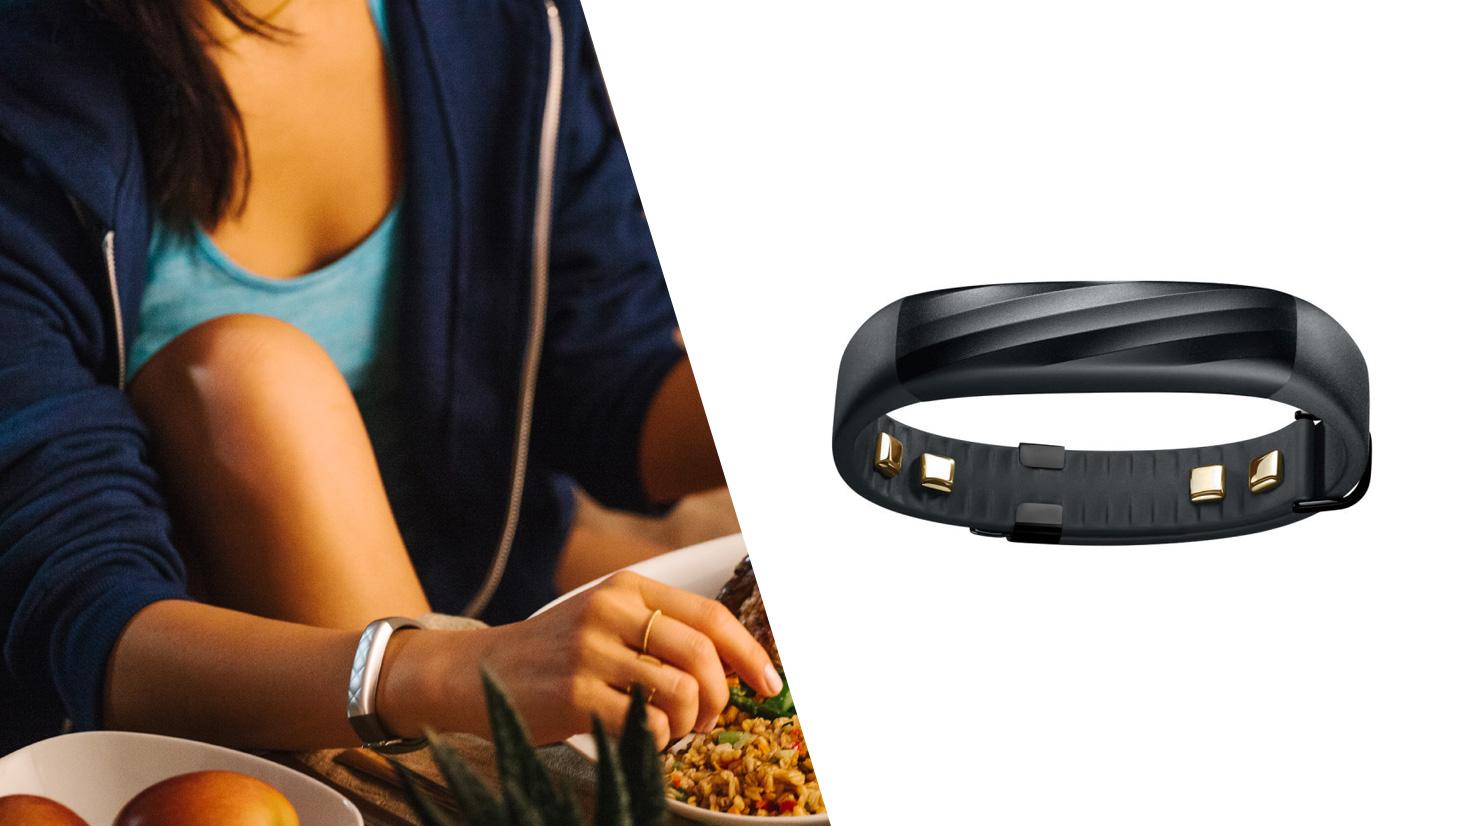 Le bracelet Jawbone UP3